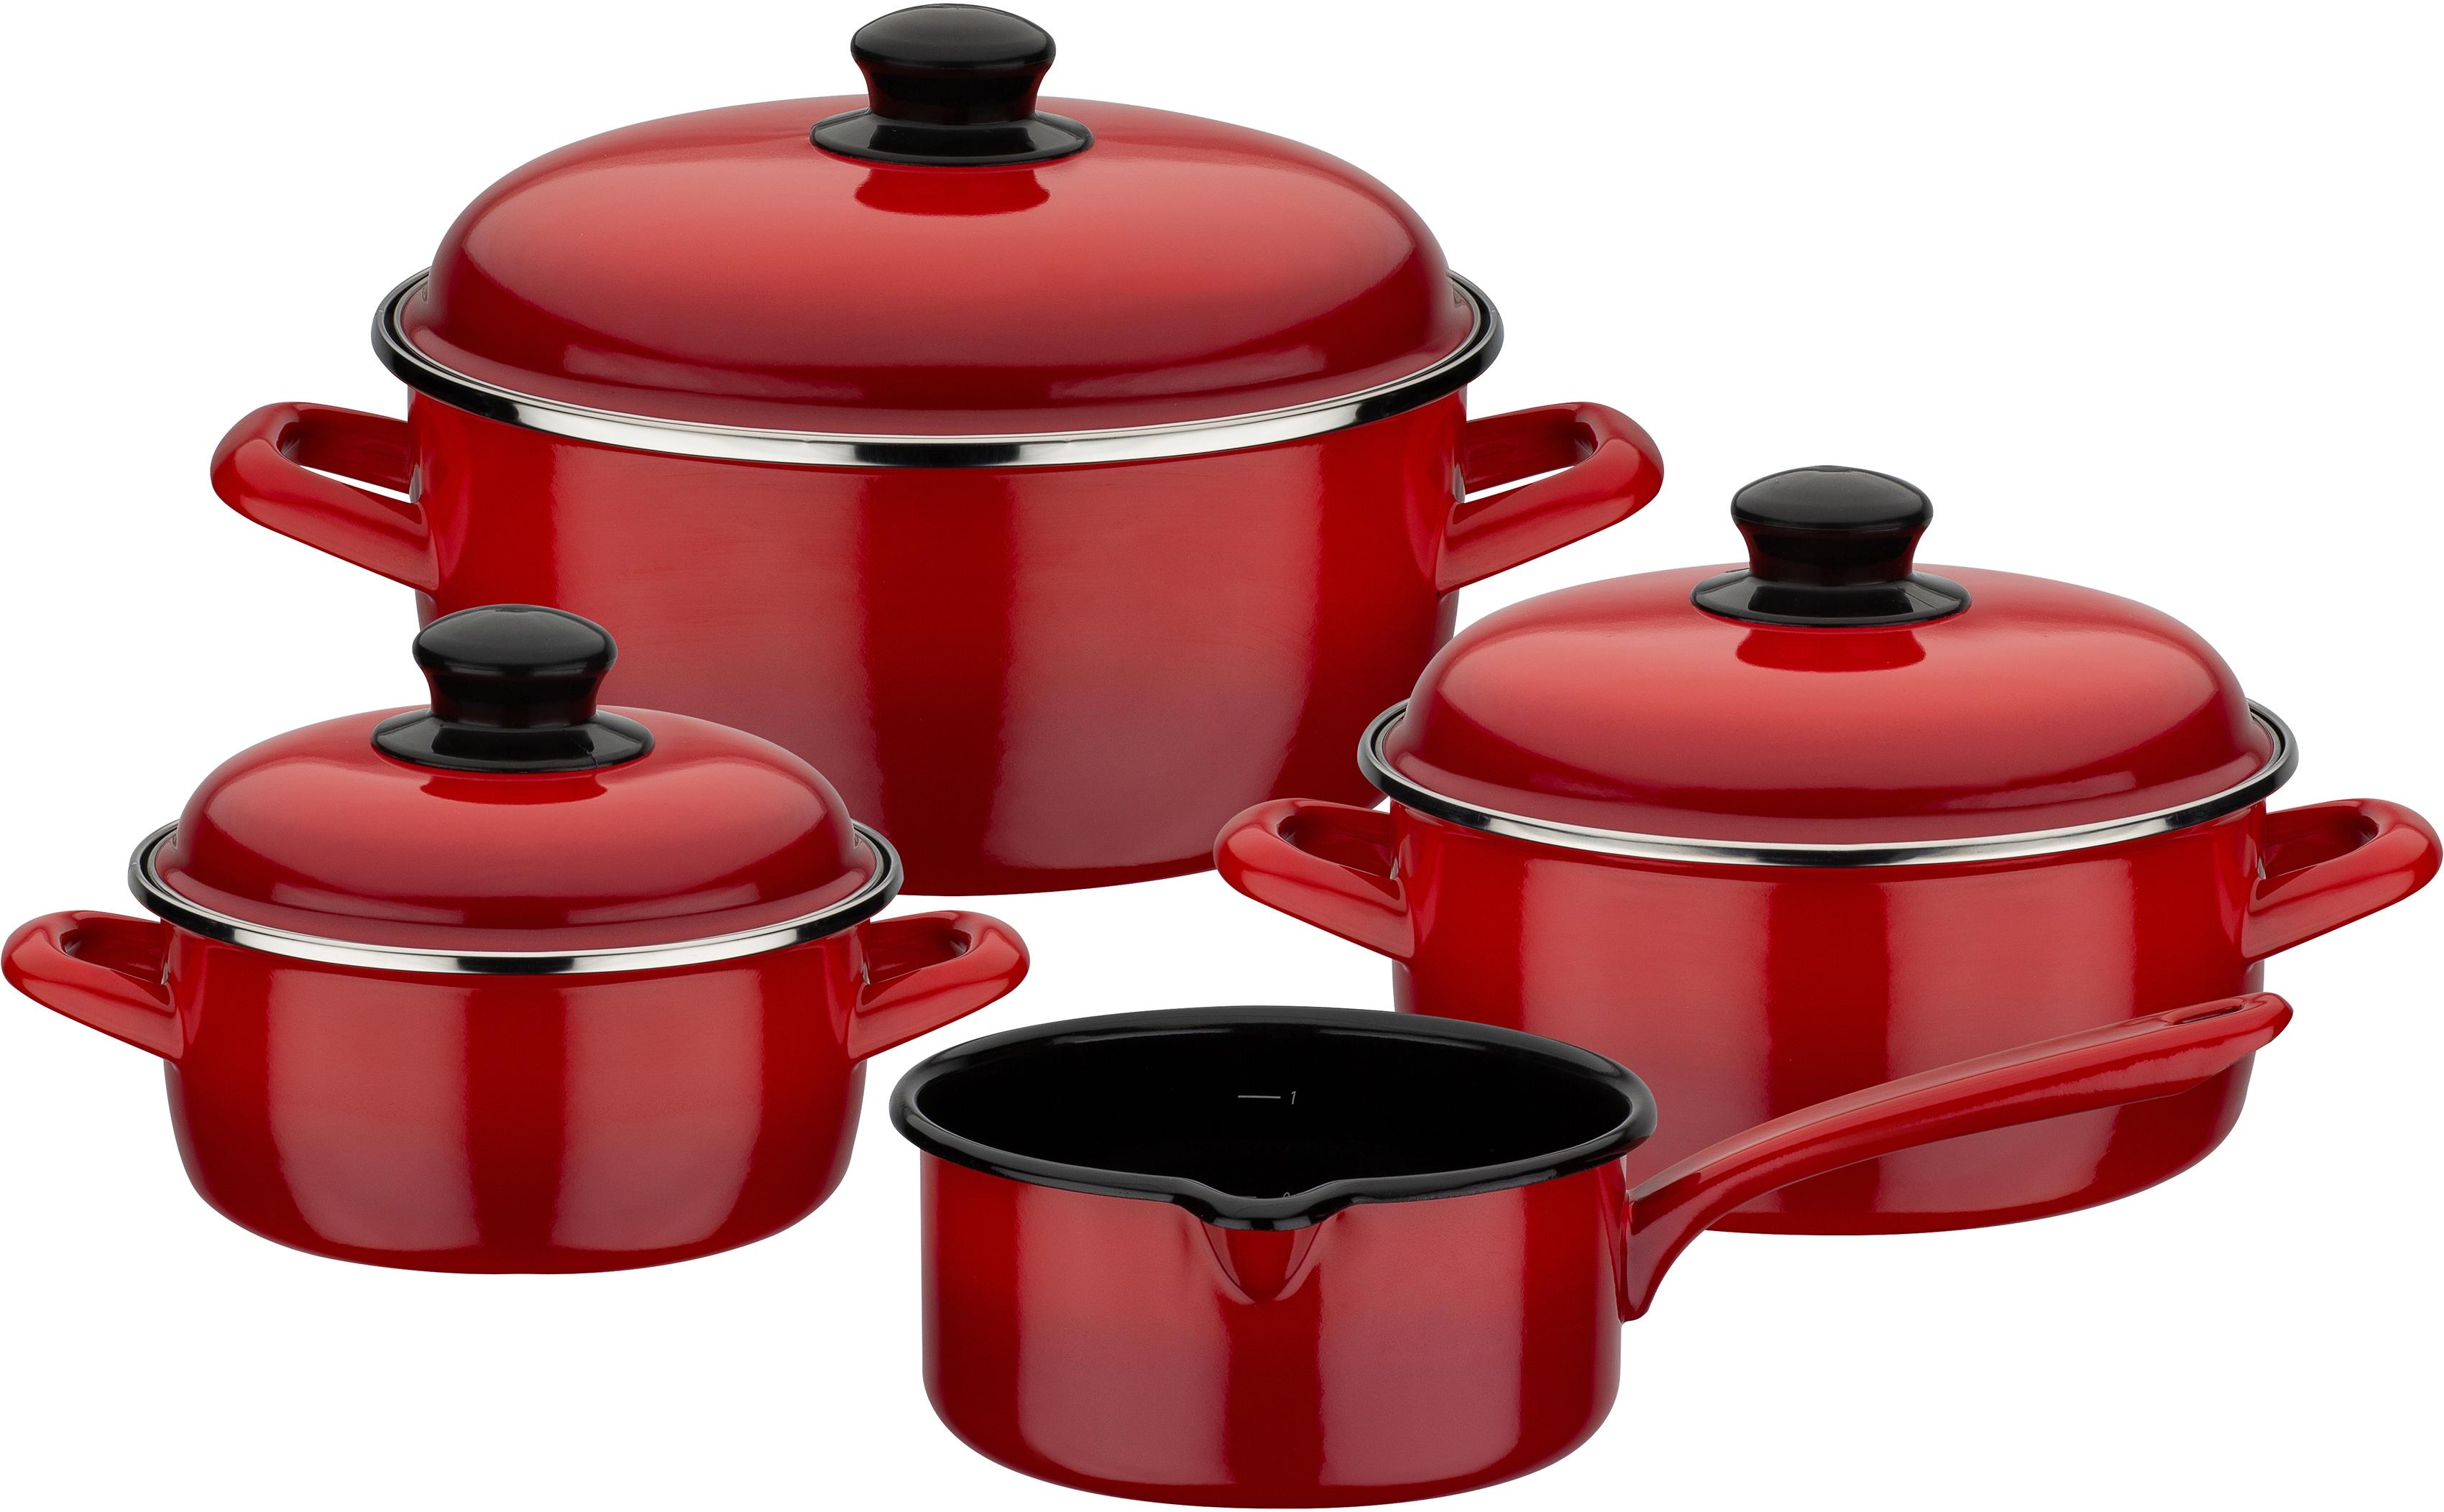 GSW Topf-Set Red Shadow, Emaille, (Set, 7 tlg.), Induktion rot Topfsets Töpfe Haushaltswaren